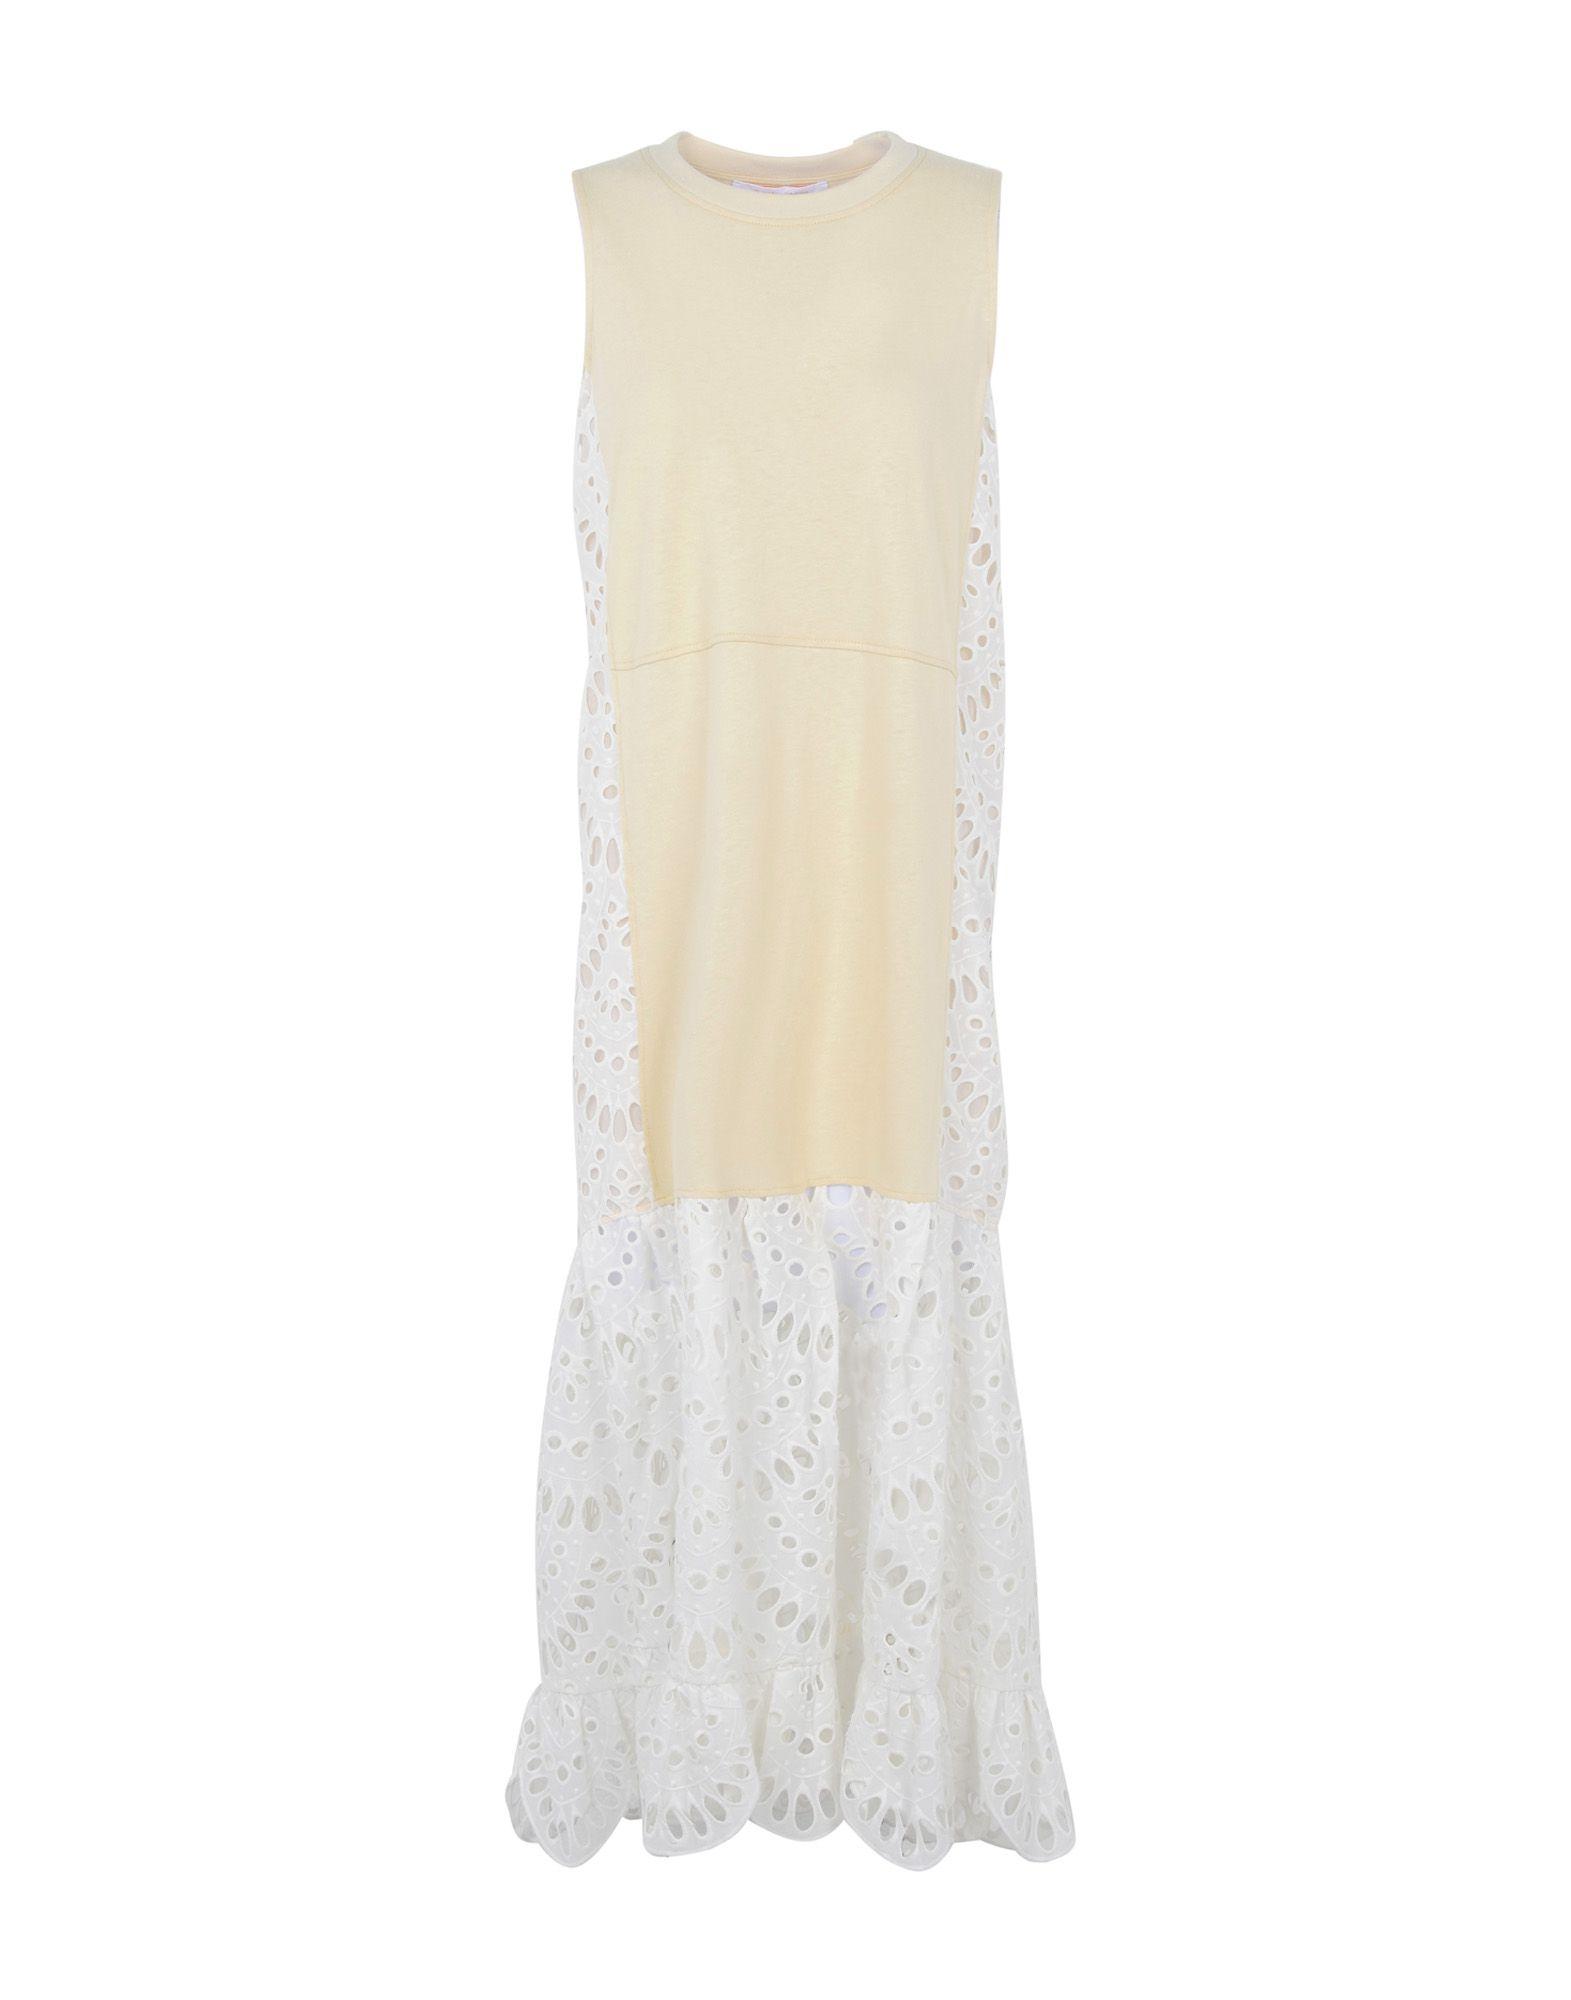 SEE BY CHLOÉ Платье длиной 3/4 see by chloé платье длиной 3 4